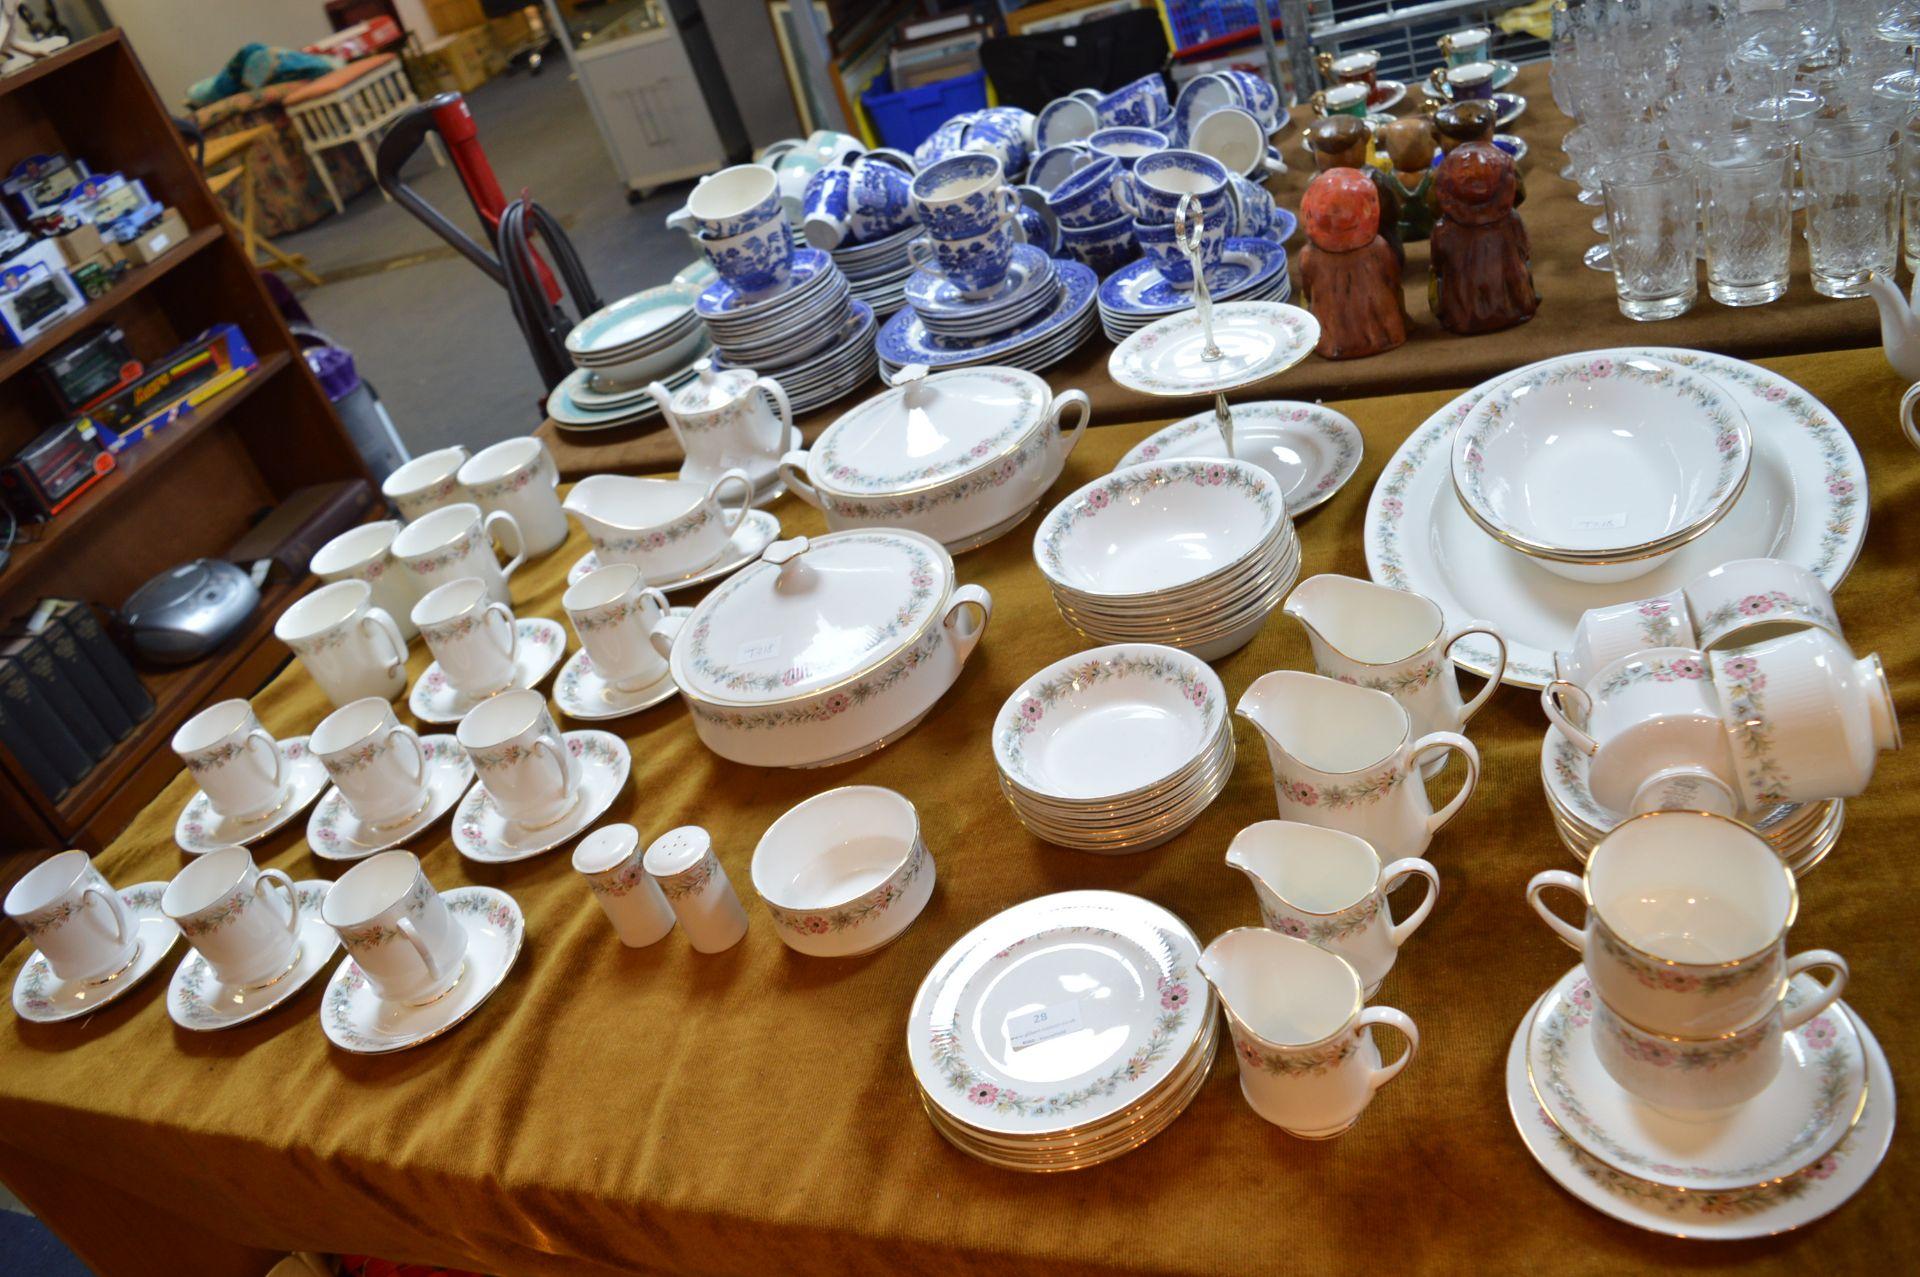 Lot 28 - 70+ Pieces of Paragon Dinnerware